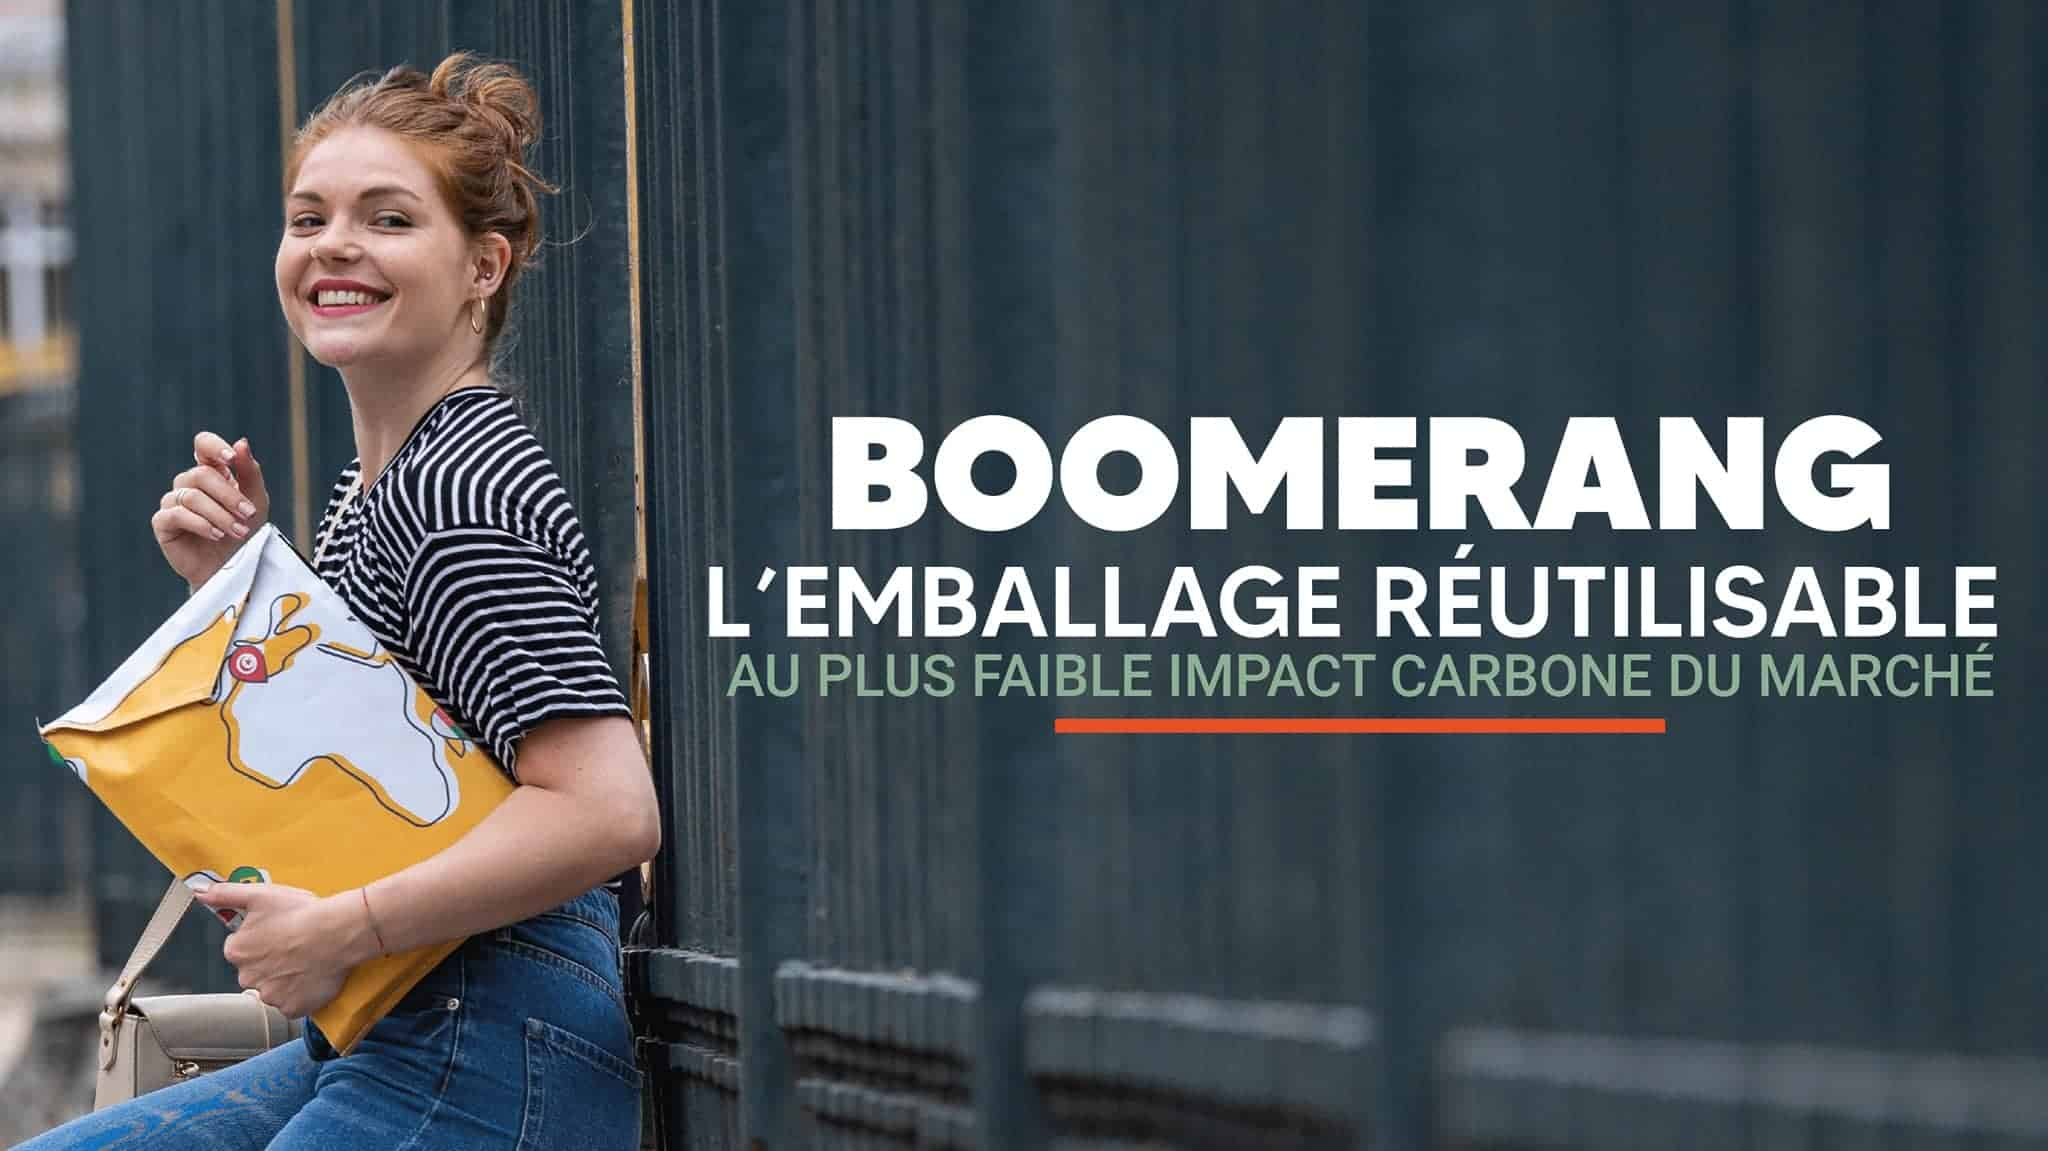 Boomerang - Emballage réutilisable